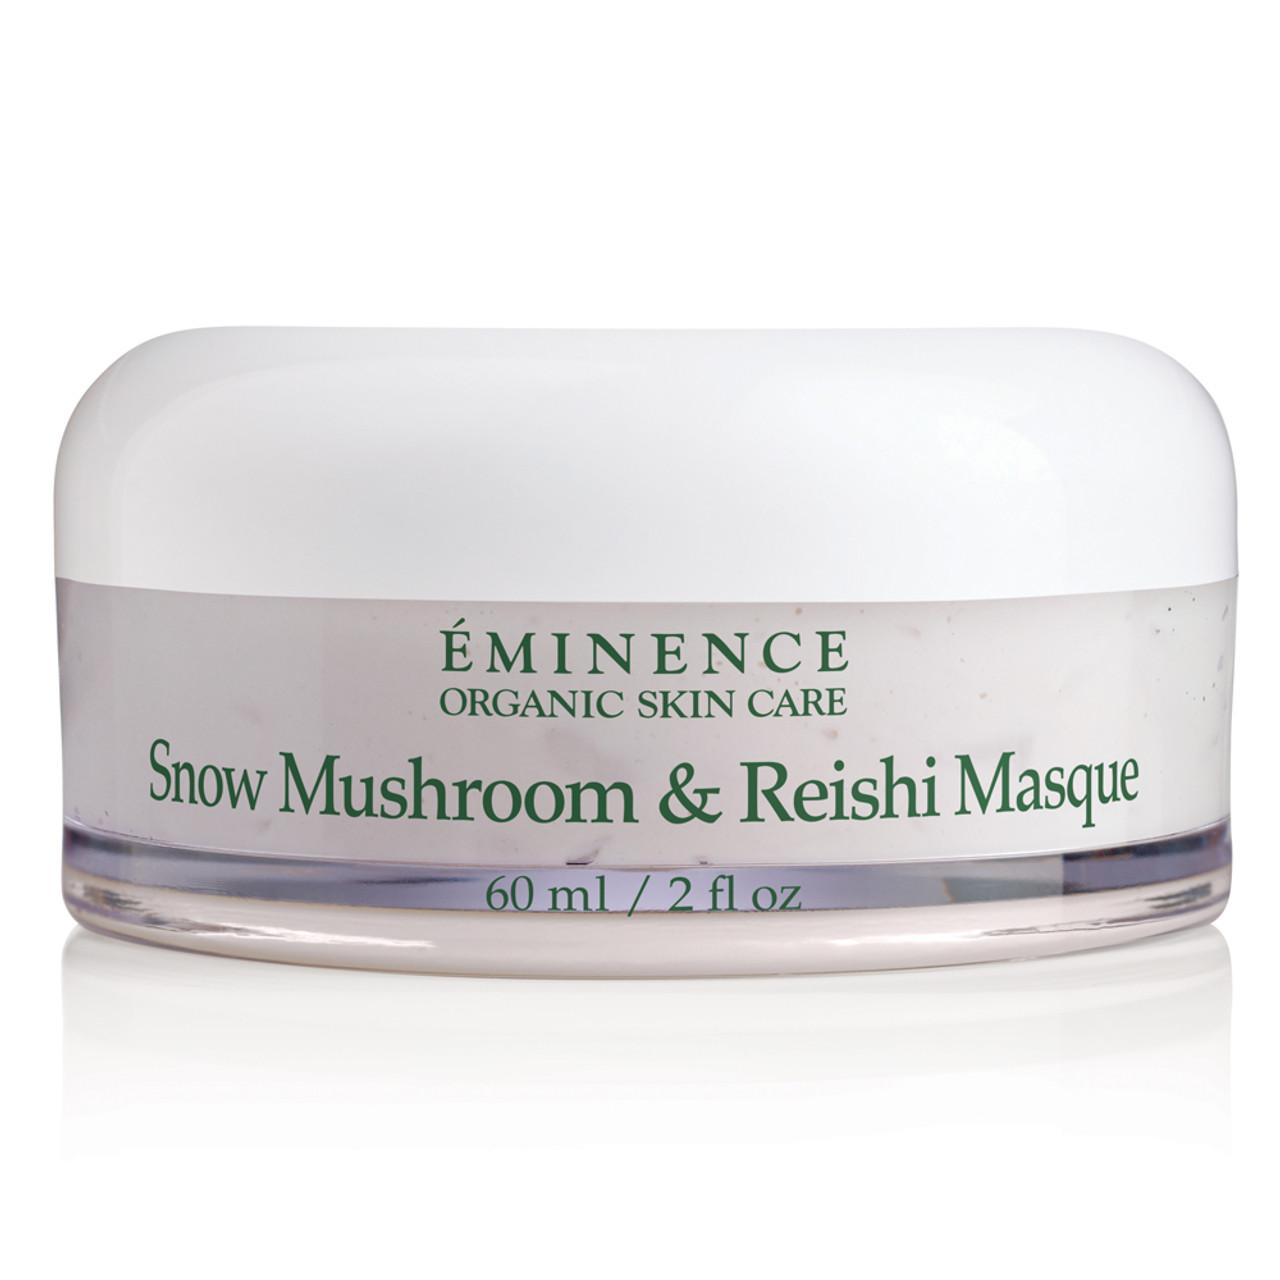 Eminence Snow Mushroom & Reishi Masque